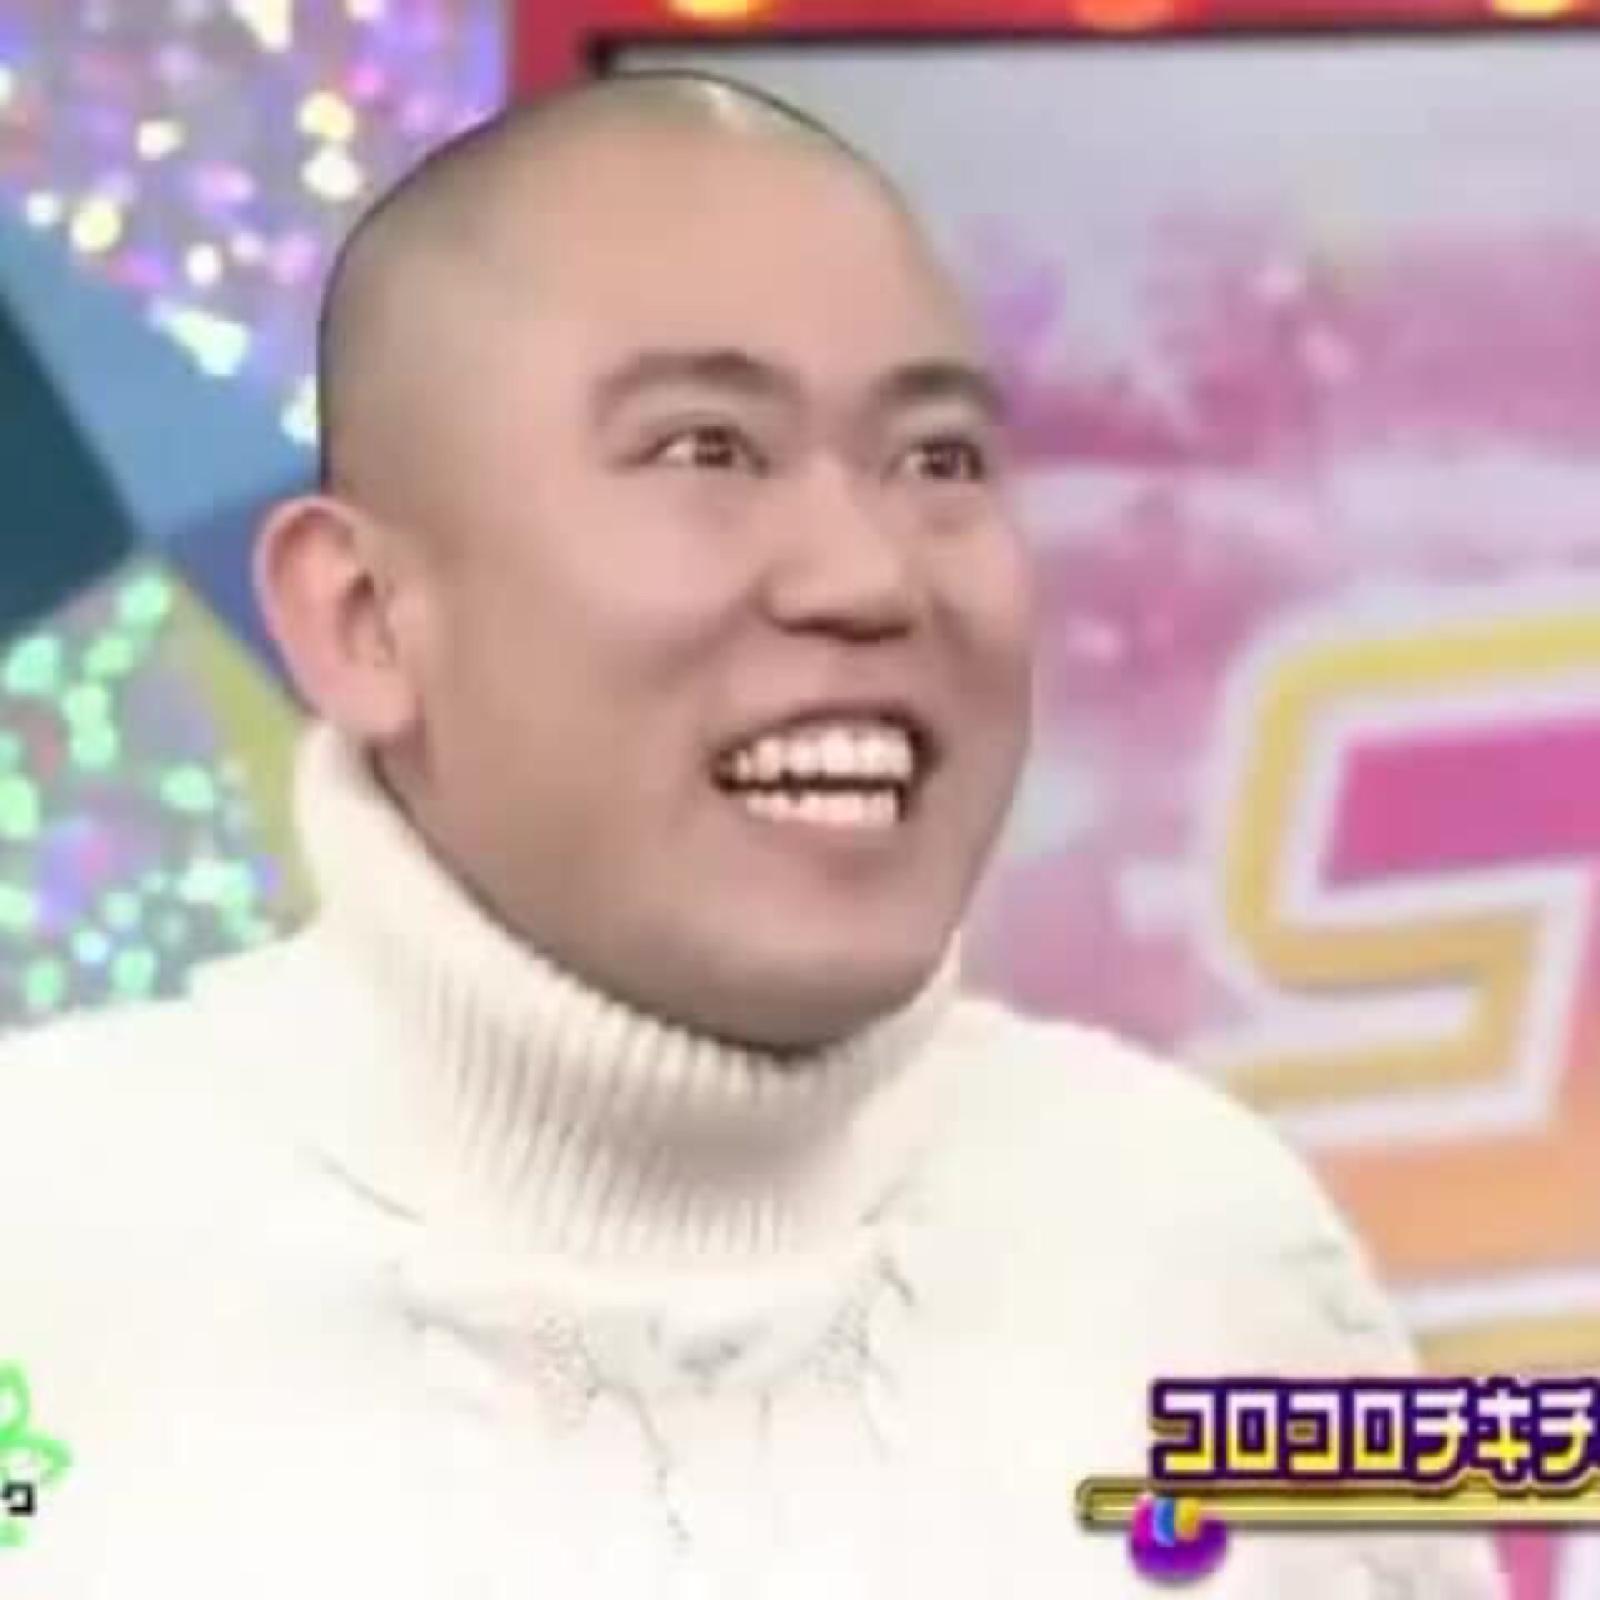 norikooさんのロイヤル